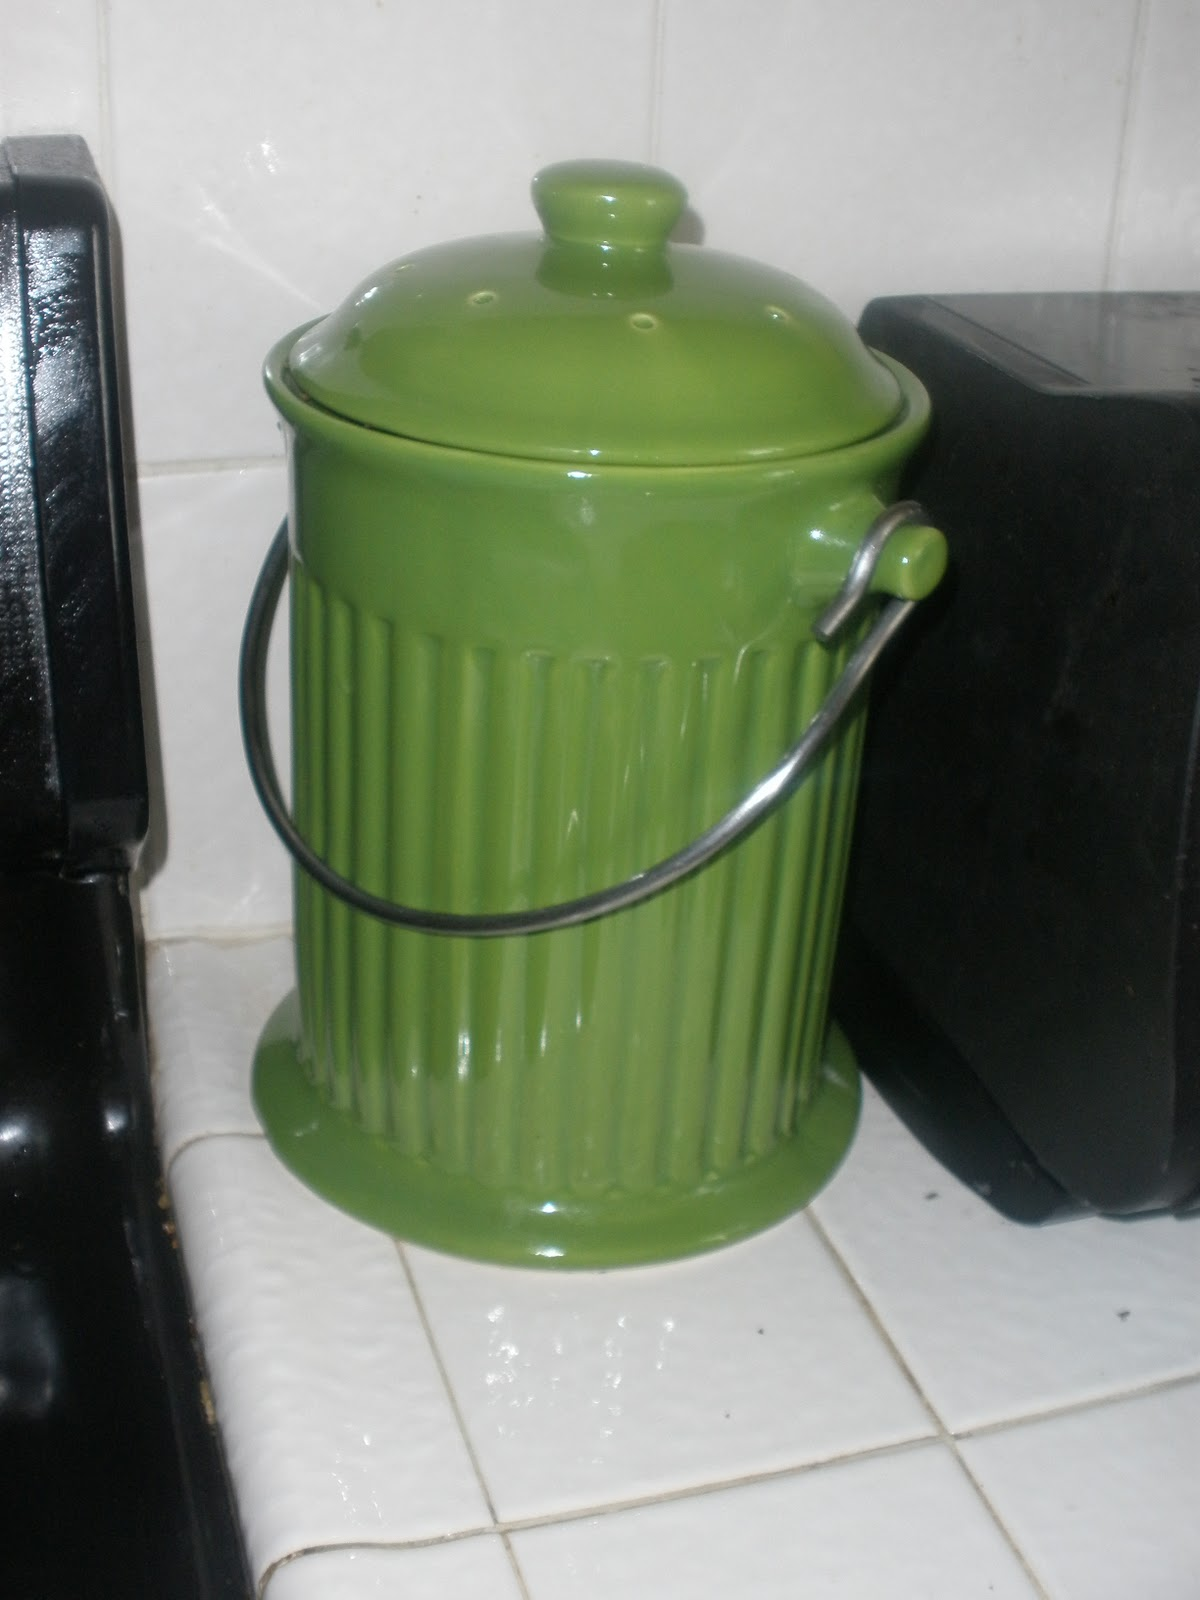 Countertop Compost Bin : ... 10 in rewards cash, I picked out this adorable countertop compost bin